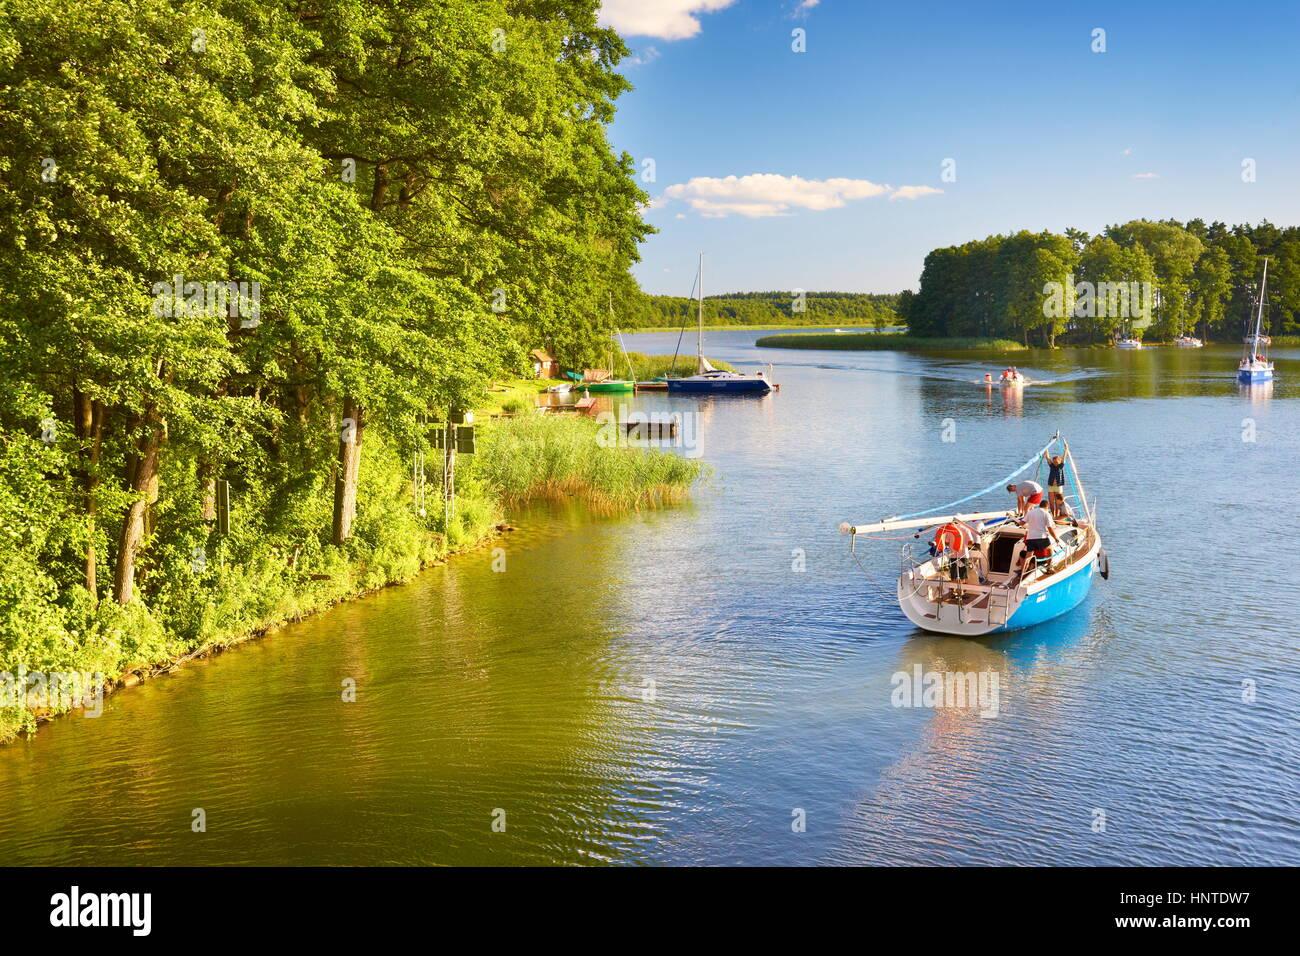 Velero en El Lago Sztynort, región de Masuria, en Polonia, Europa Foto de stock